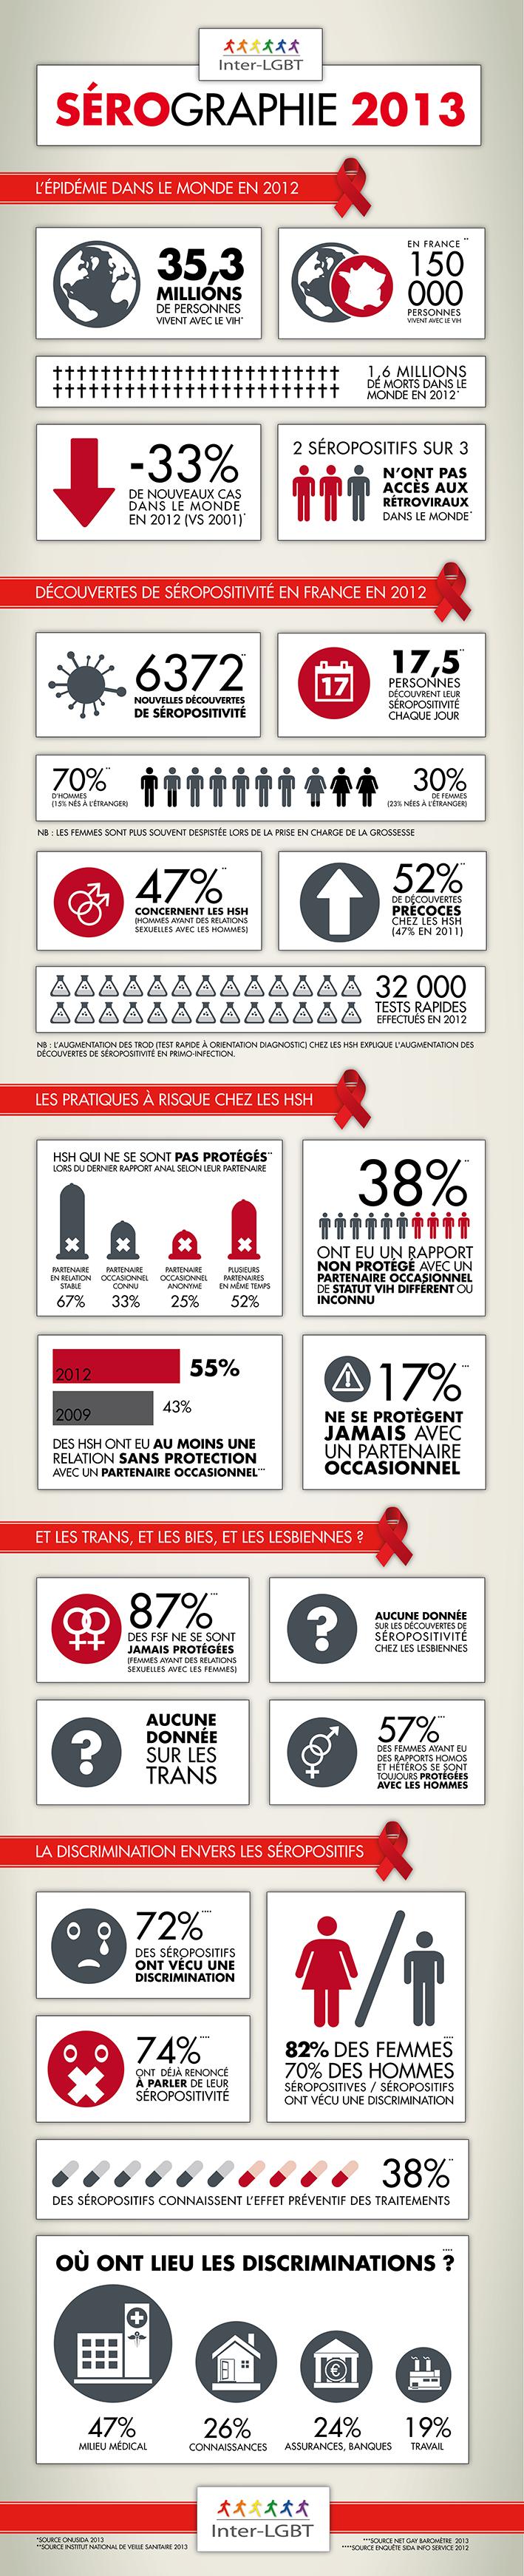 Infographie Inter-LGBT